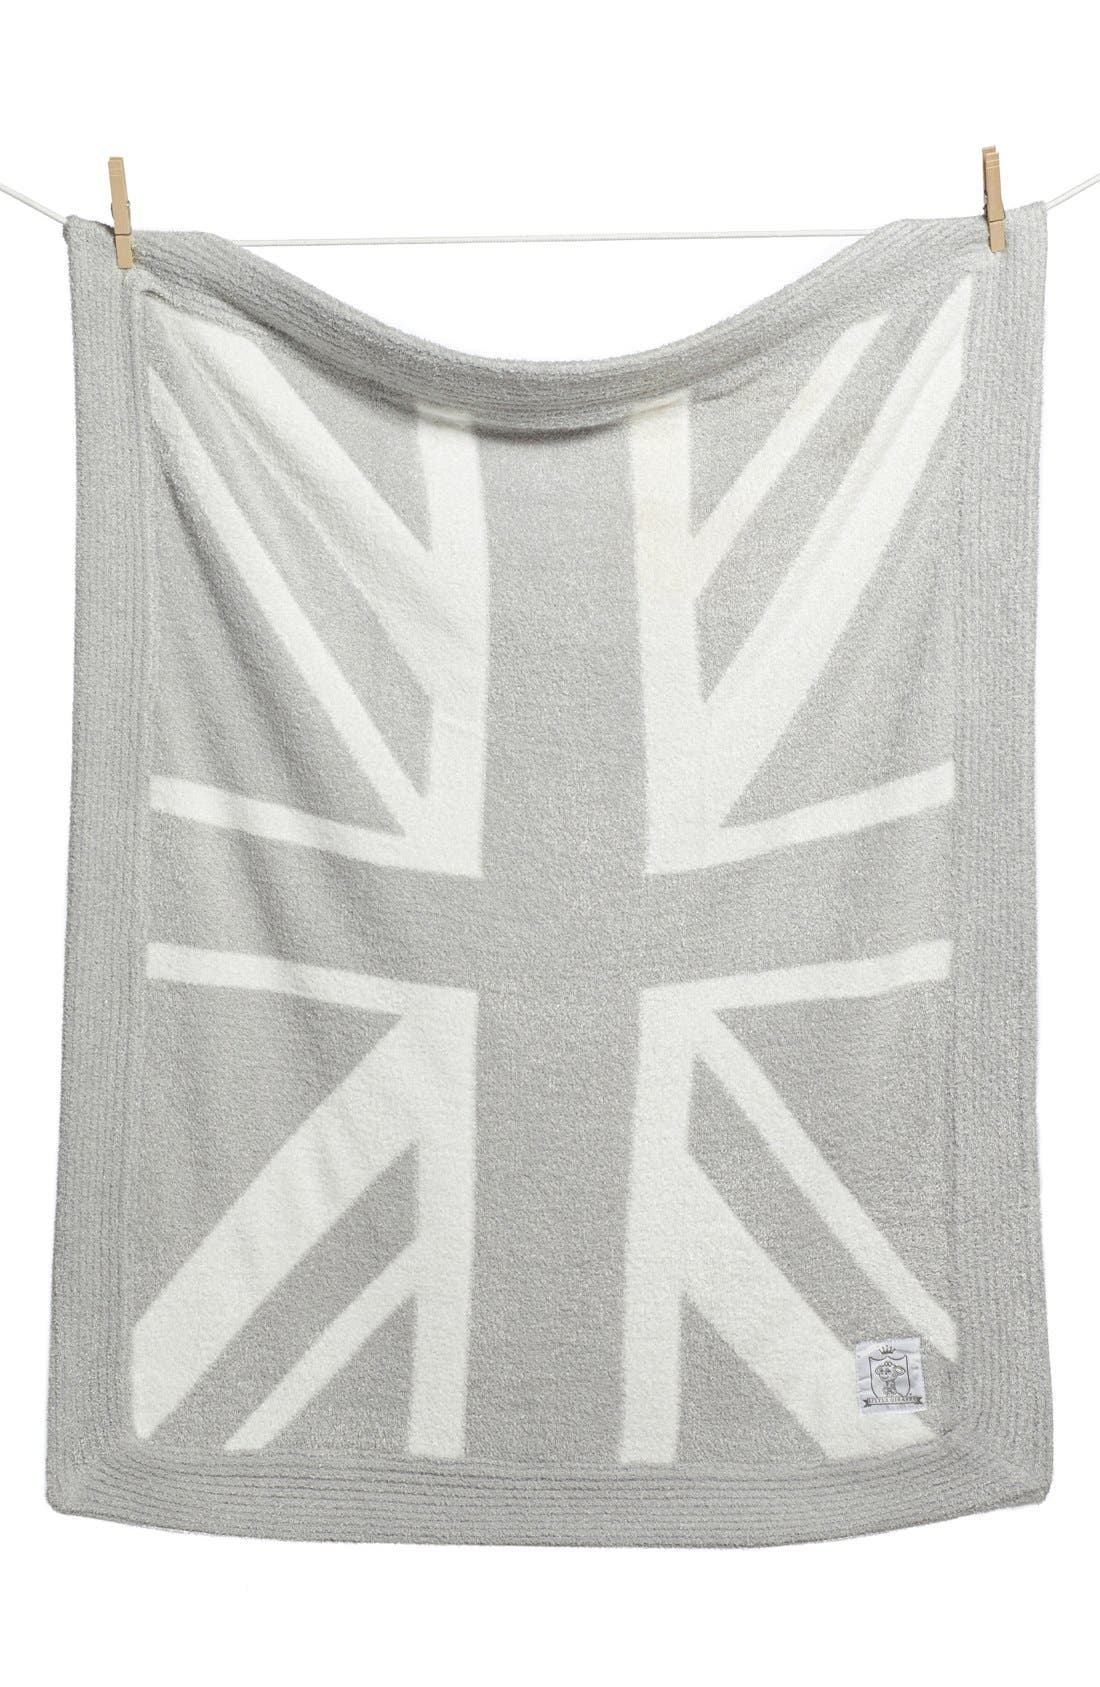 Little Giraffe 'Dolce Union Jack' Blanket